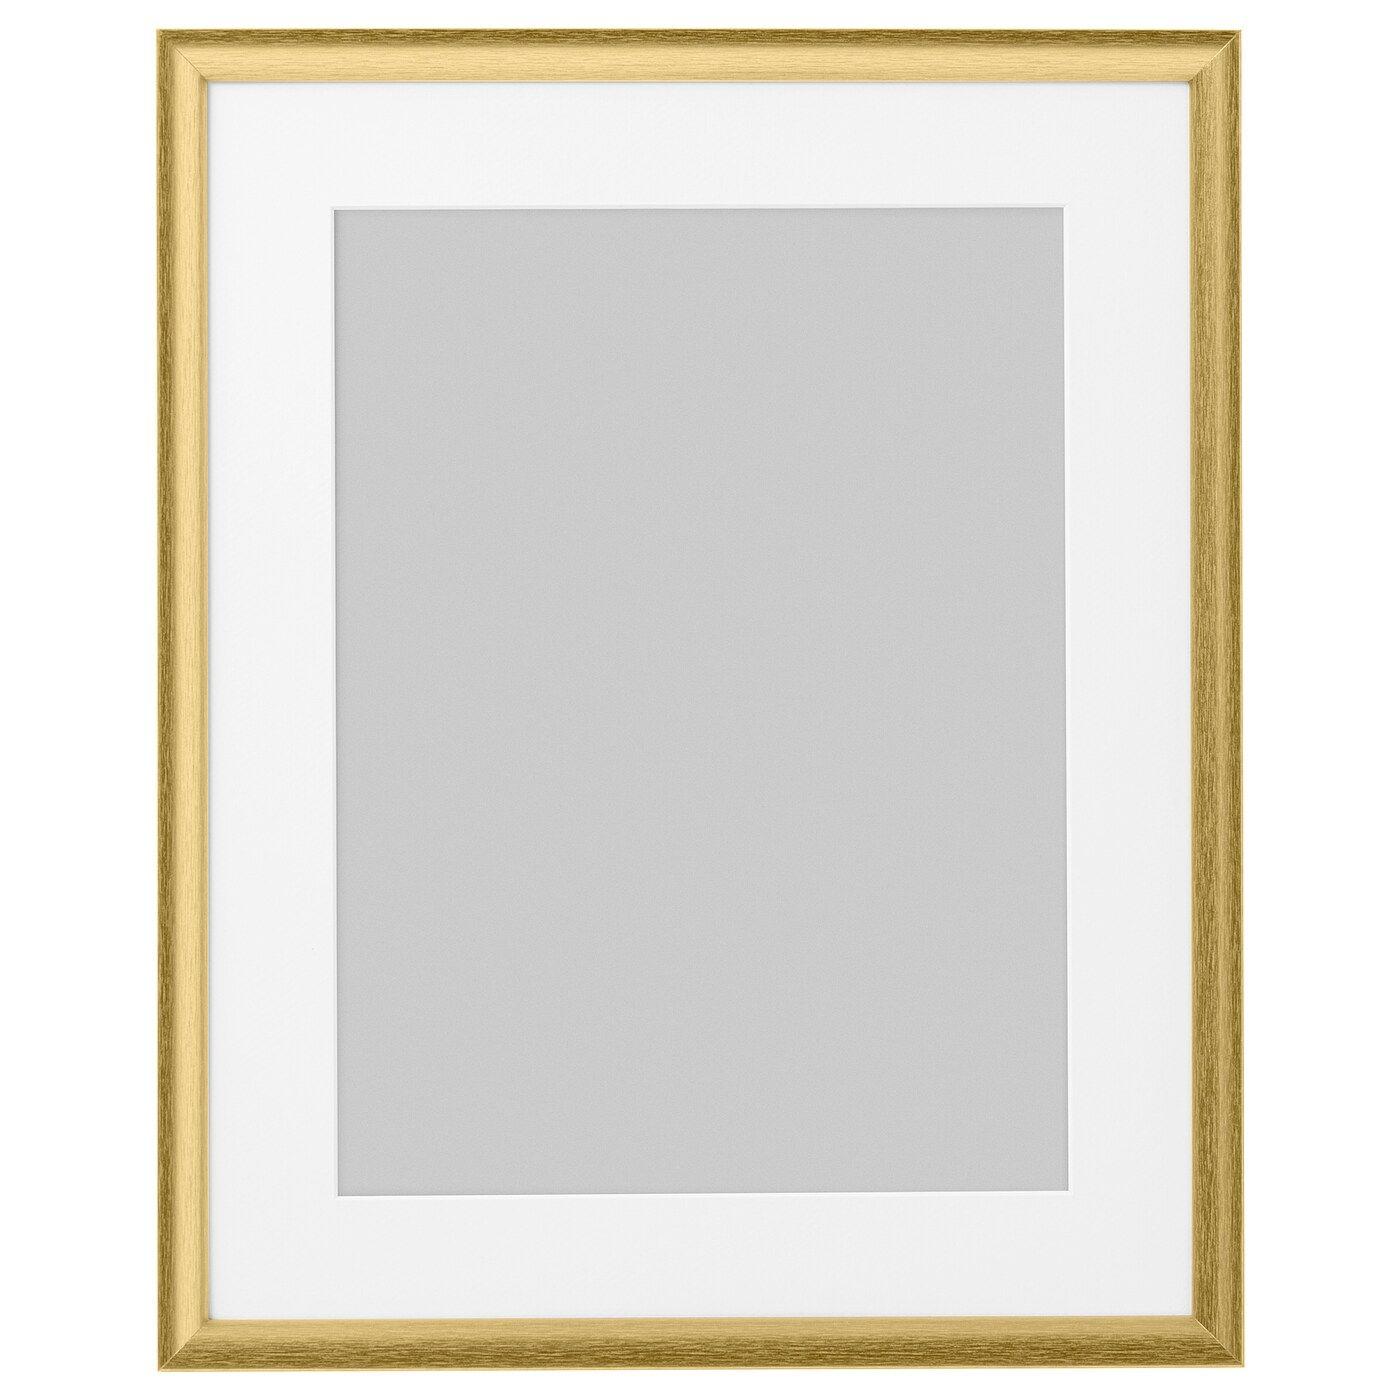 Silverhojden Frame Gold 16x20 Ikea Gold Picture Frames Frame Frames On Wall